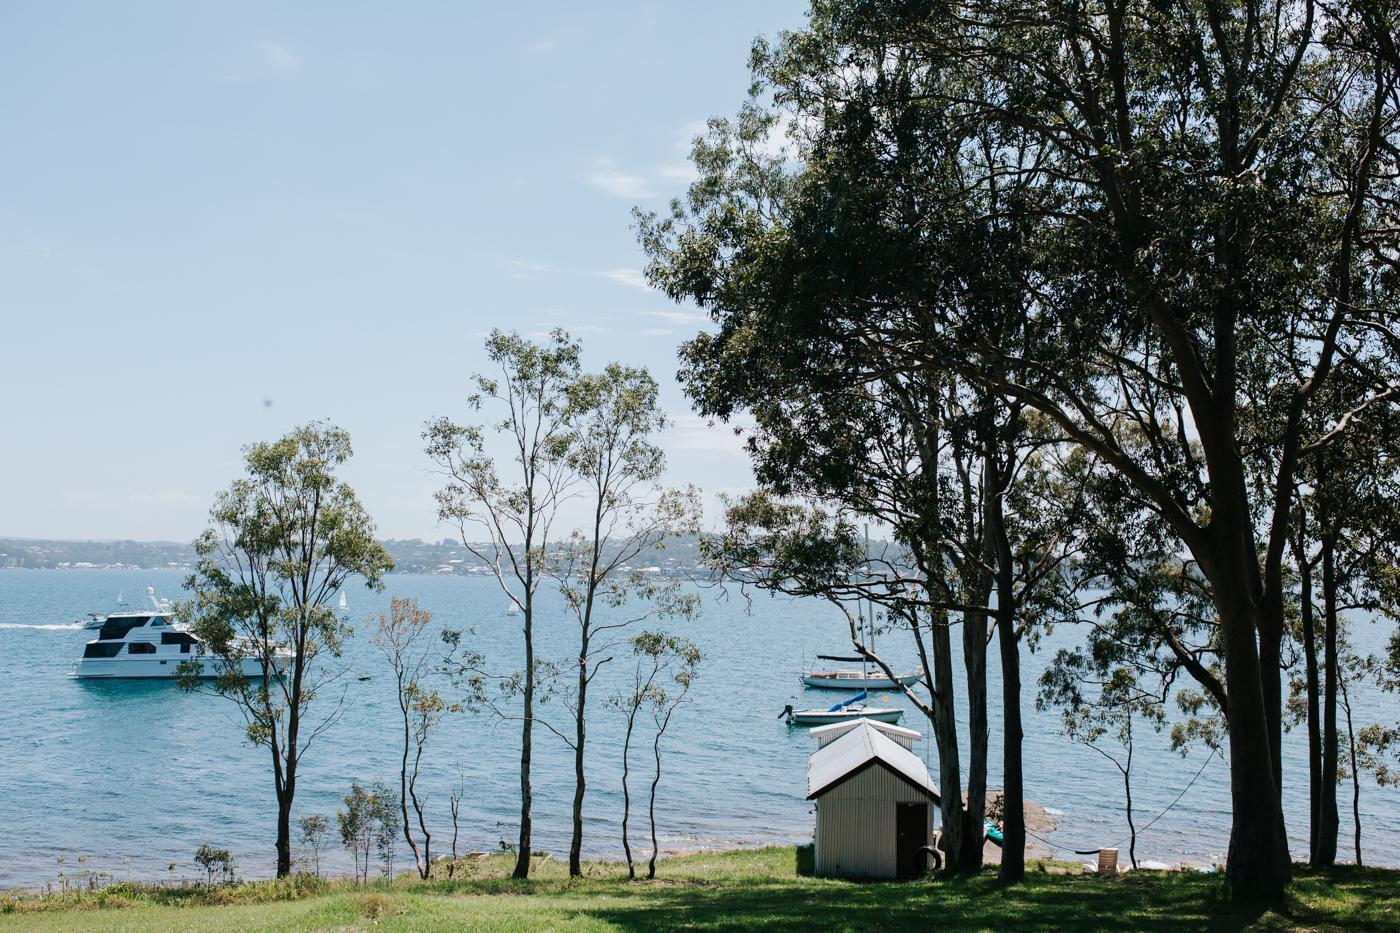 Emma & Ben - Lake Macquarie - Hunter Valley Wedding - Samantha Heather Photography-52.jpg